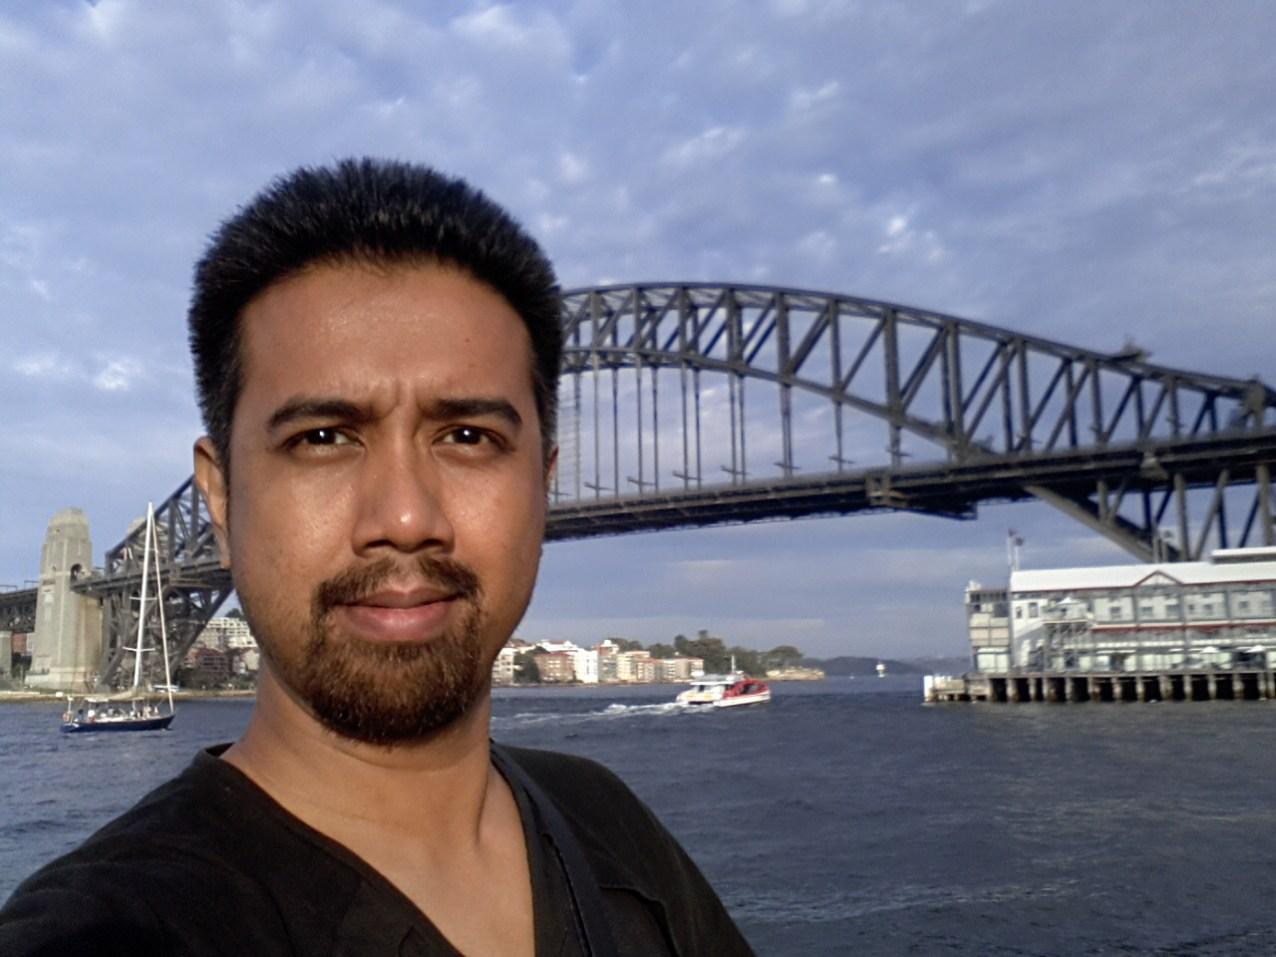 That's me during a family trip to Sydney, Australia